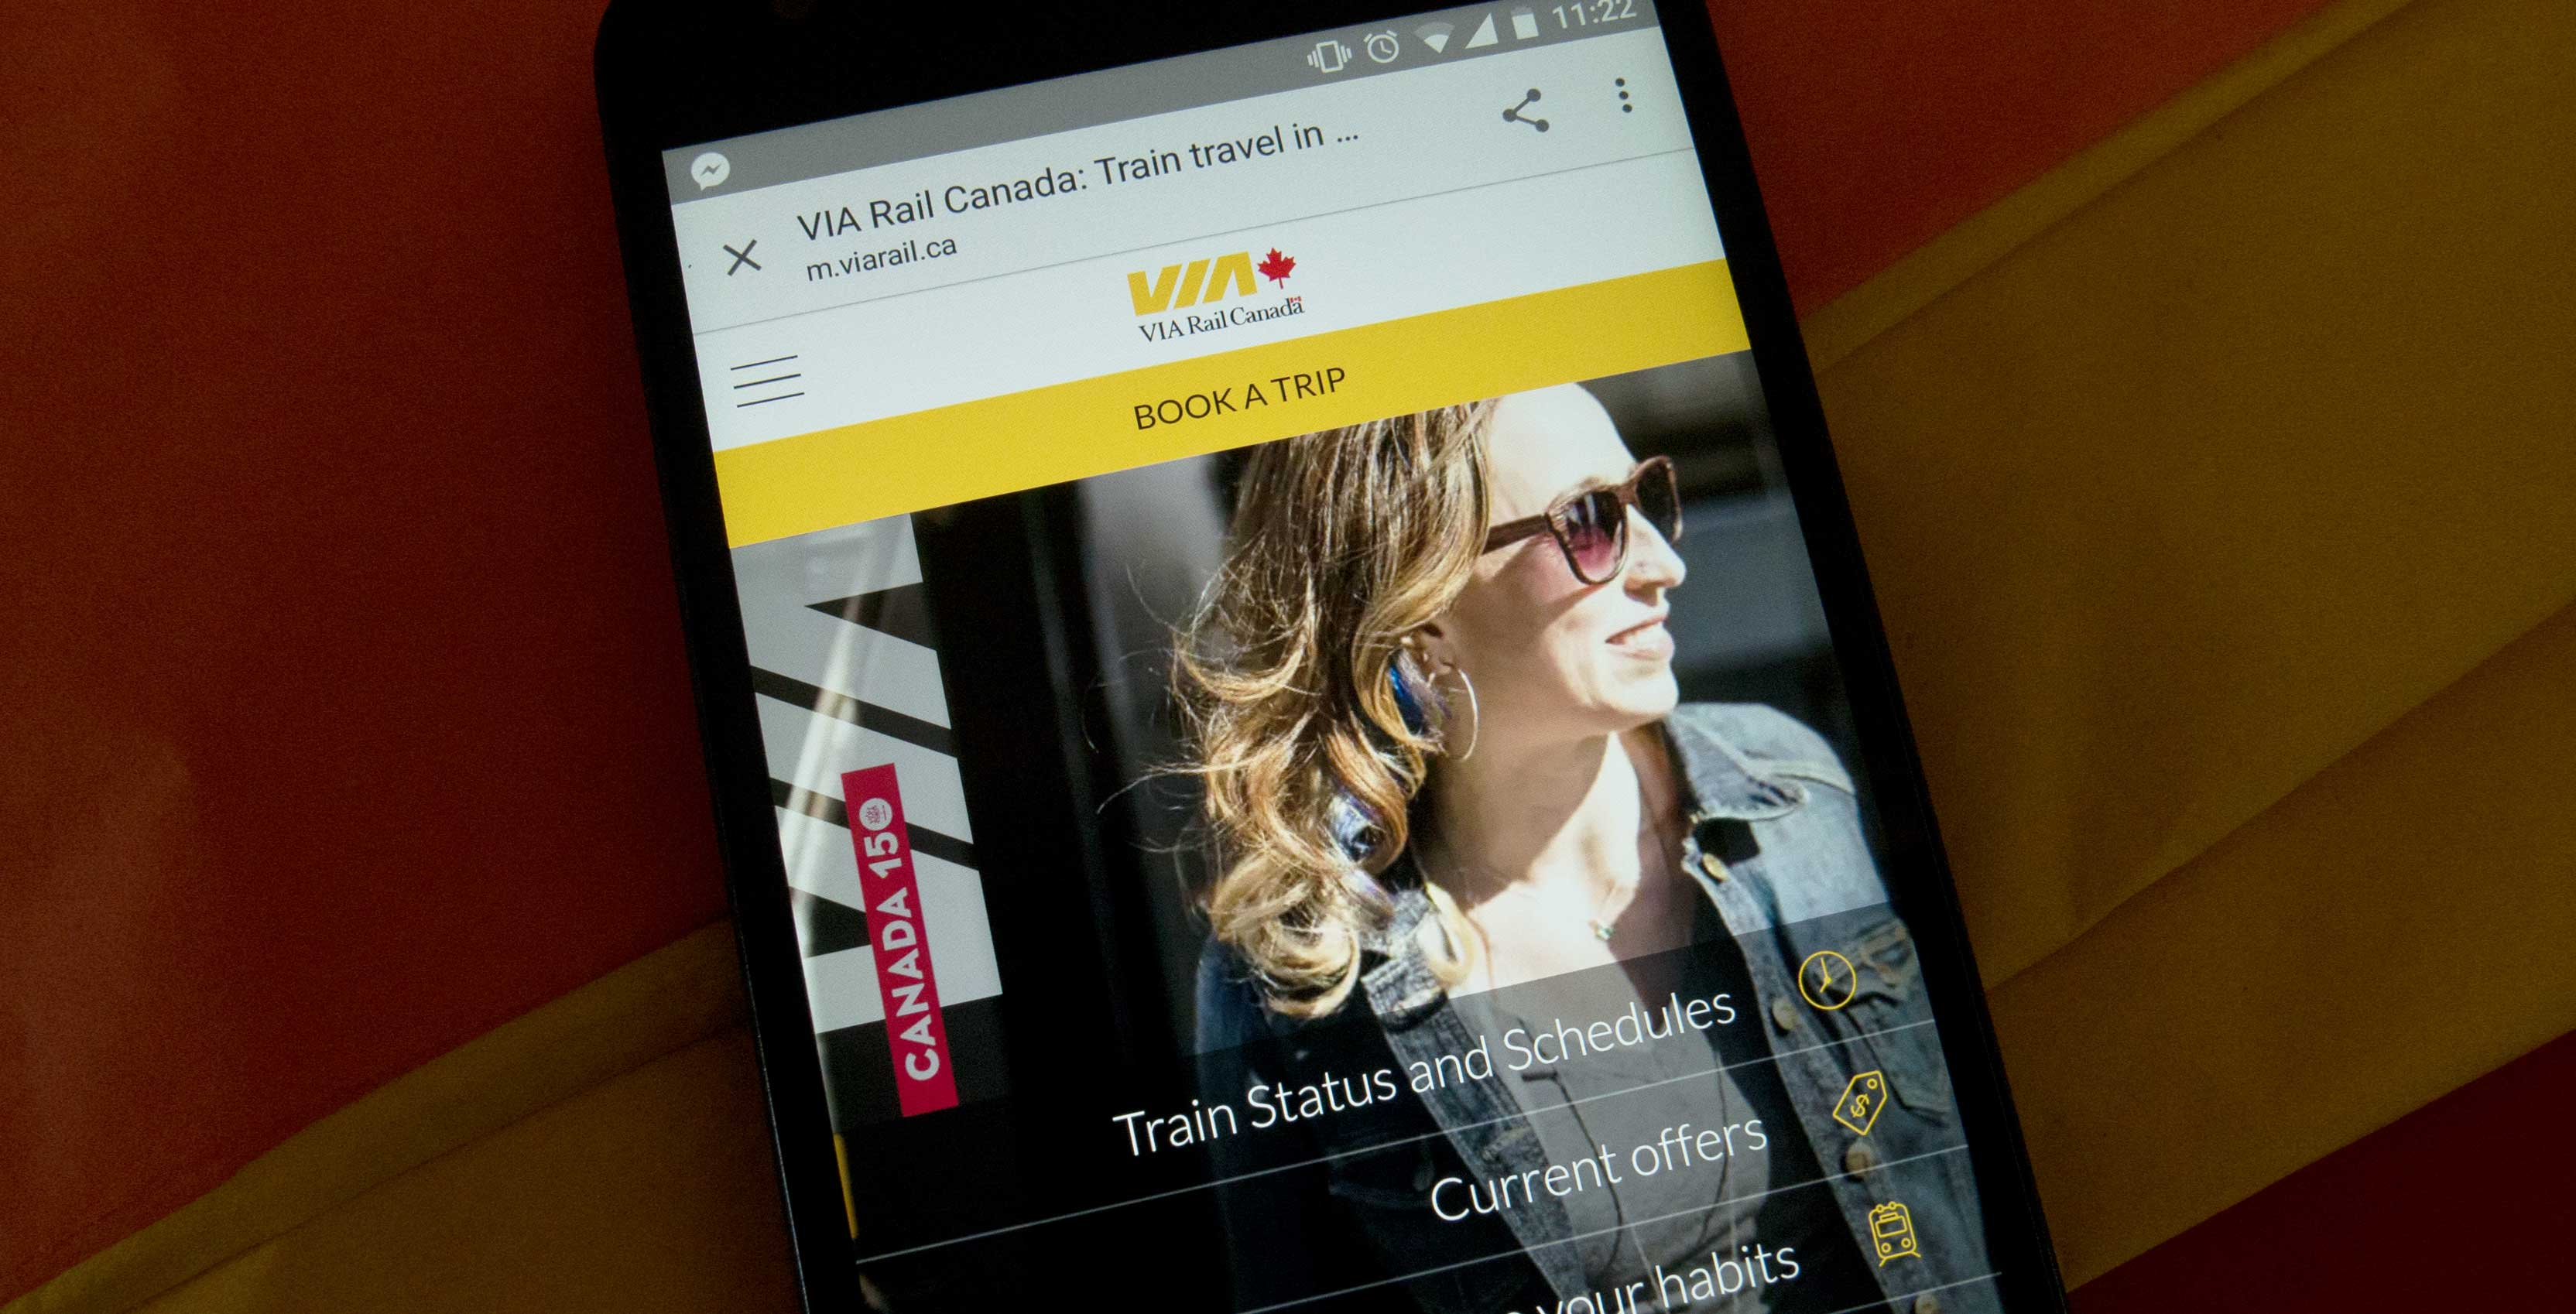 The Via Rail mobile site